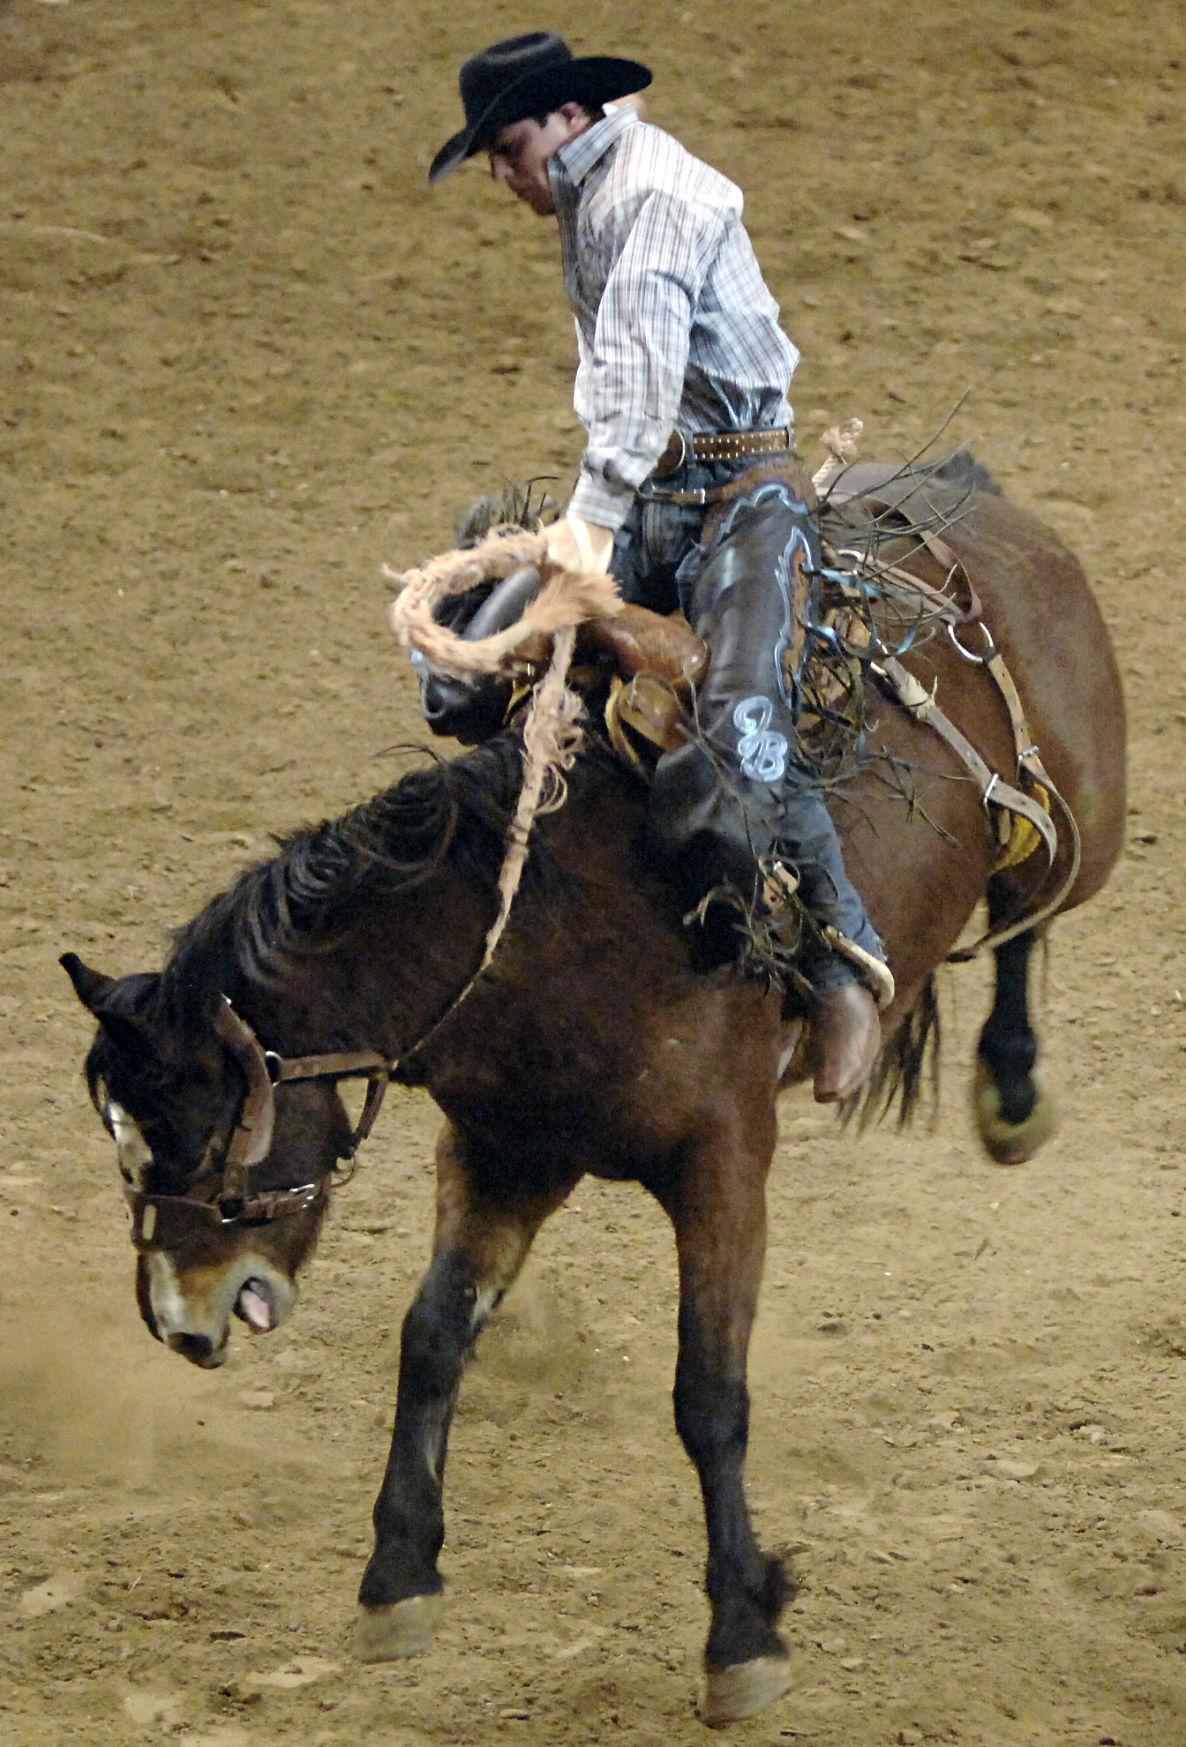 020318-spt-rodeo-1